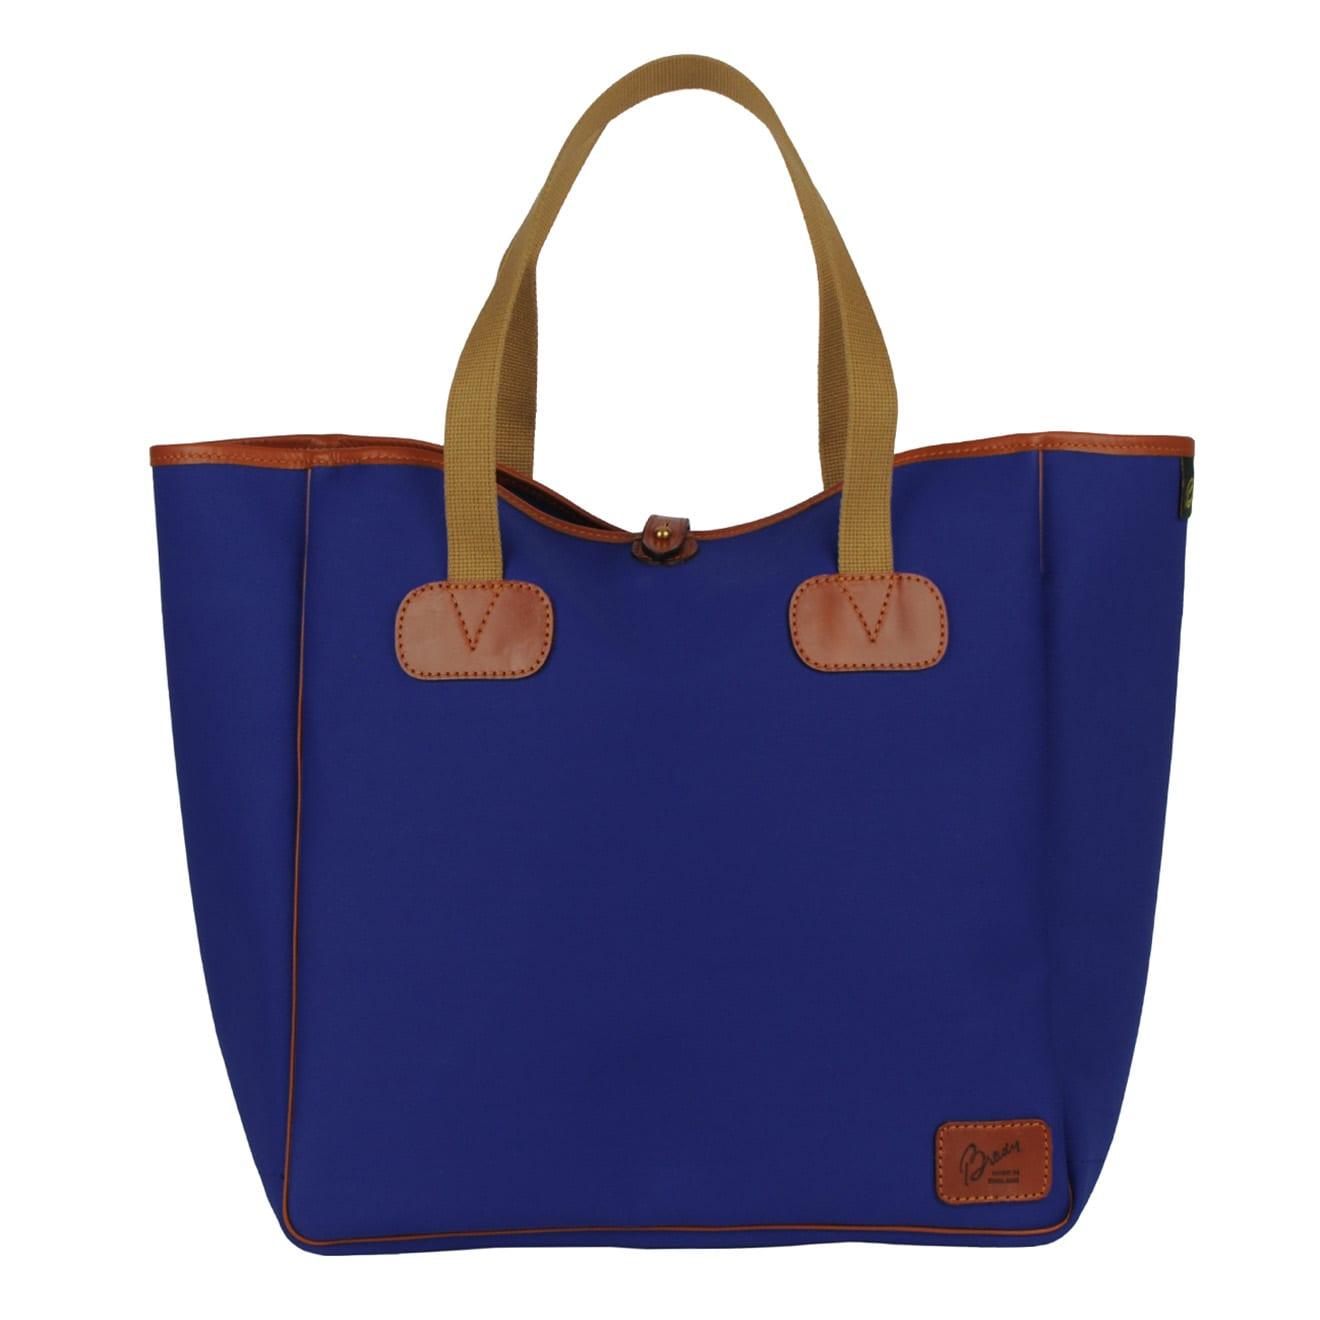 Brady Classic Tote Bag Light Blue